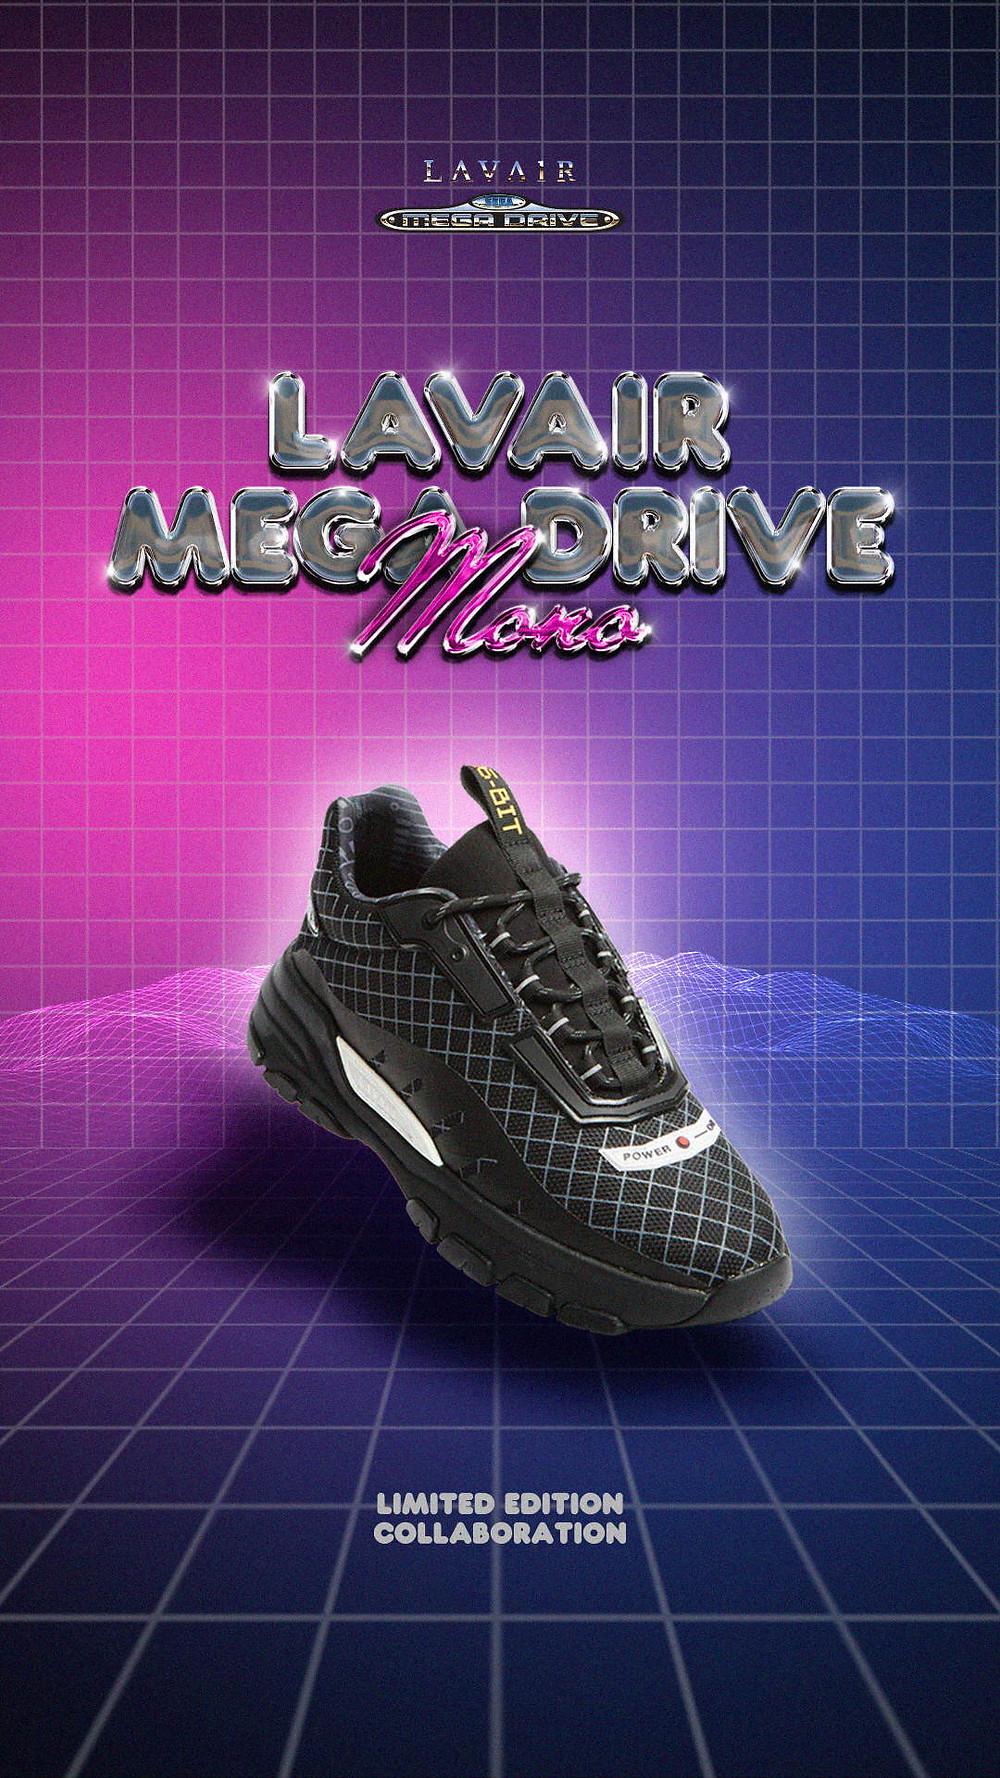 Lavair Sega Mega Drive Mono Sneaker